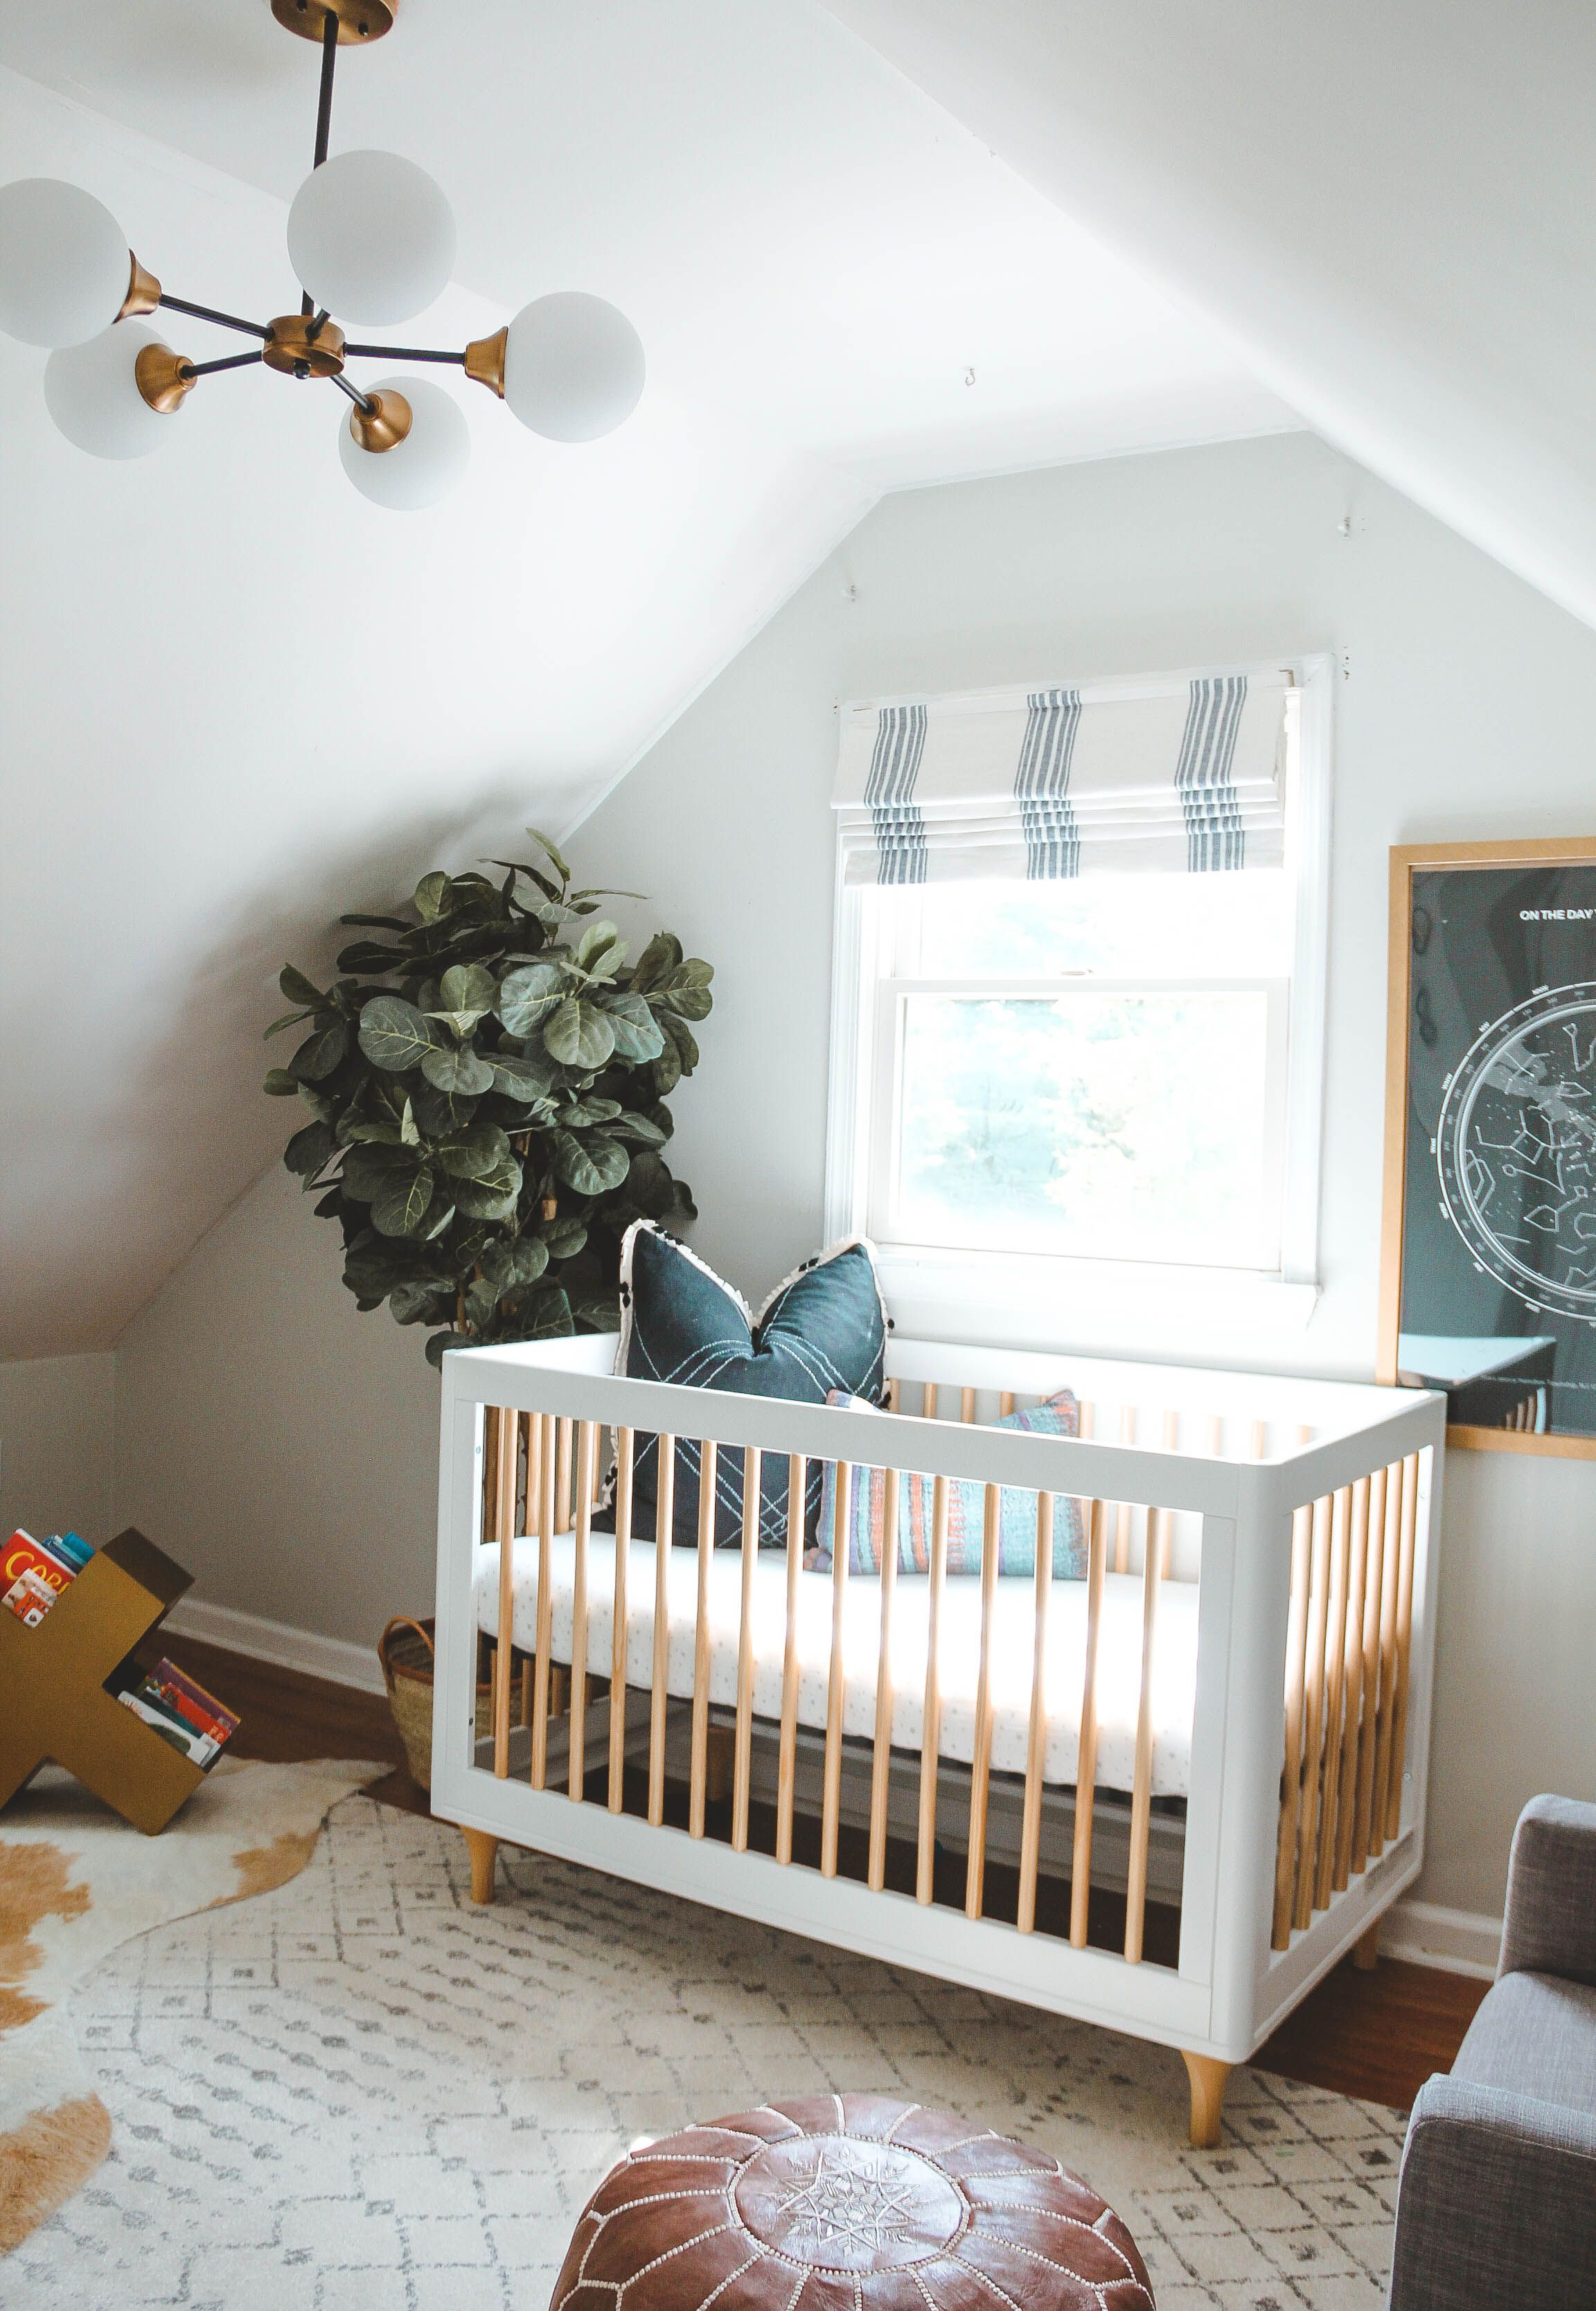 Eclectic Neutral Nursery With Boho Accents Nurserydecor Babynursery